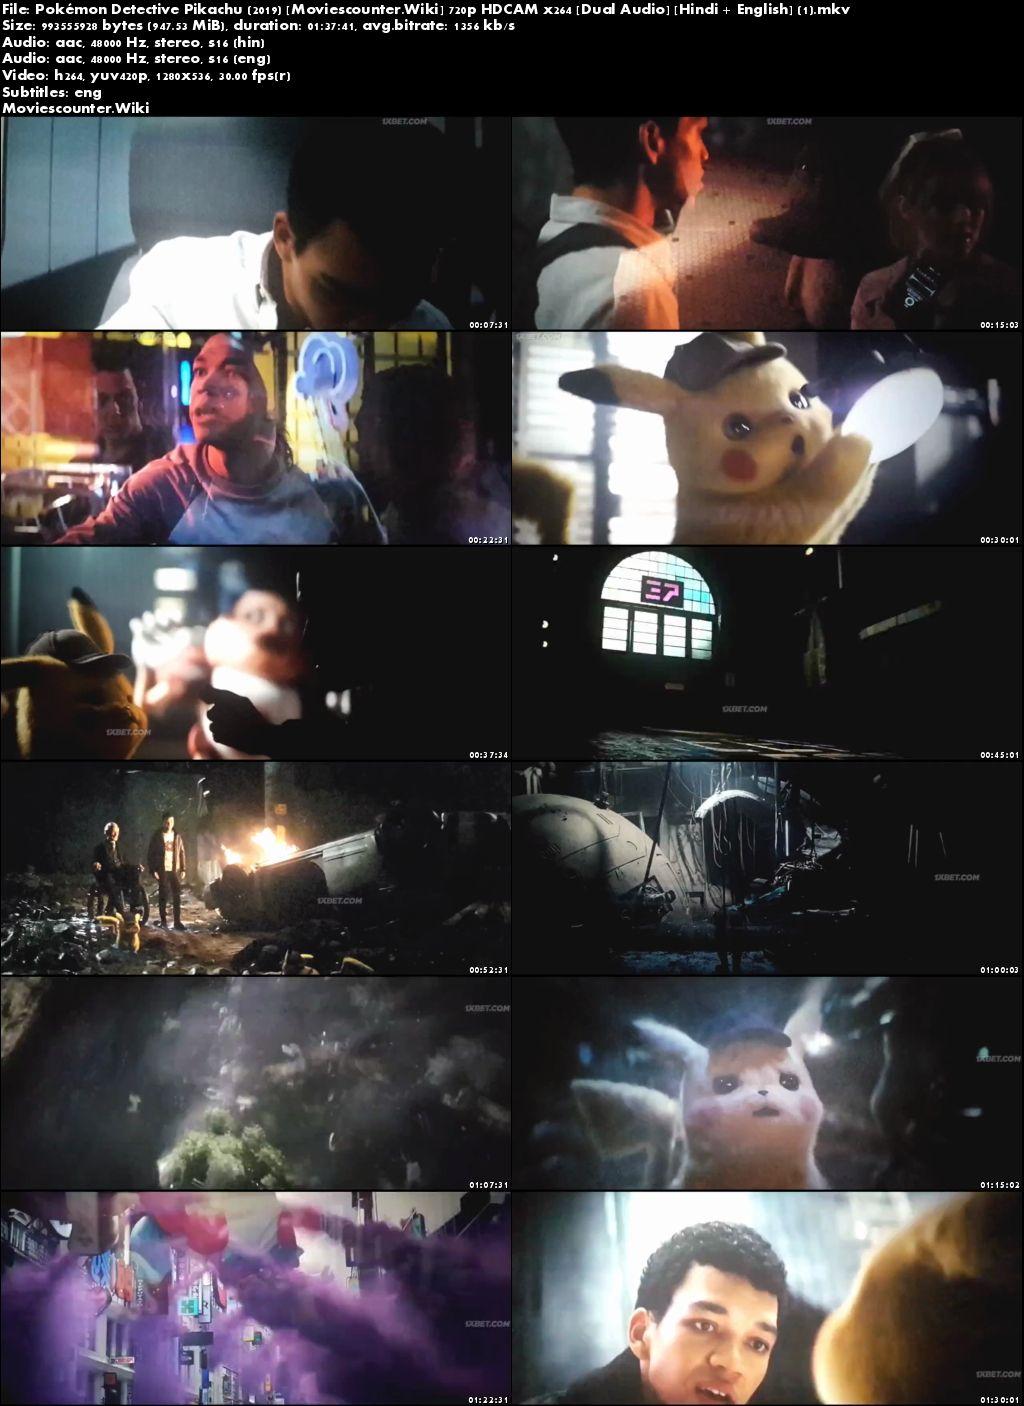 Screen Shots Pokémon Detective Pikachu 2019 Dual Audio HD 720p